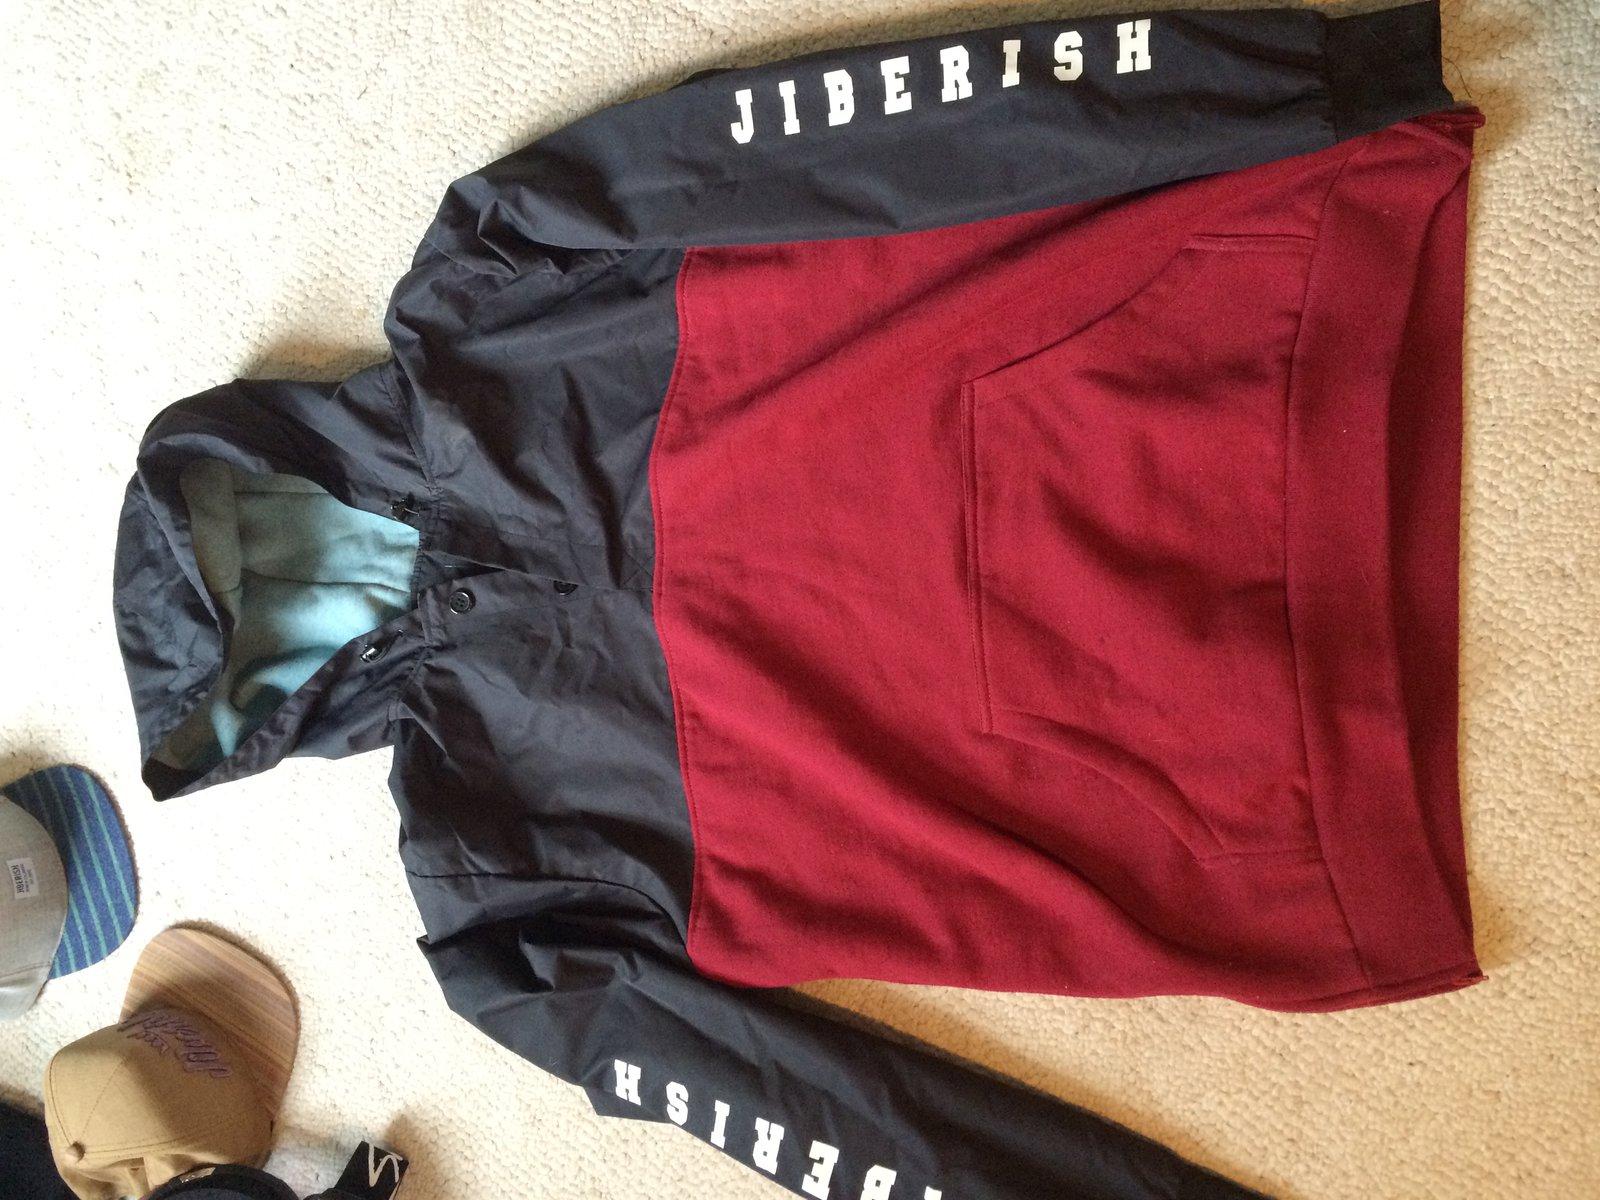 xxl jiberish hoody/ jacket